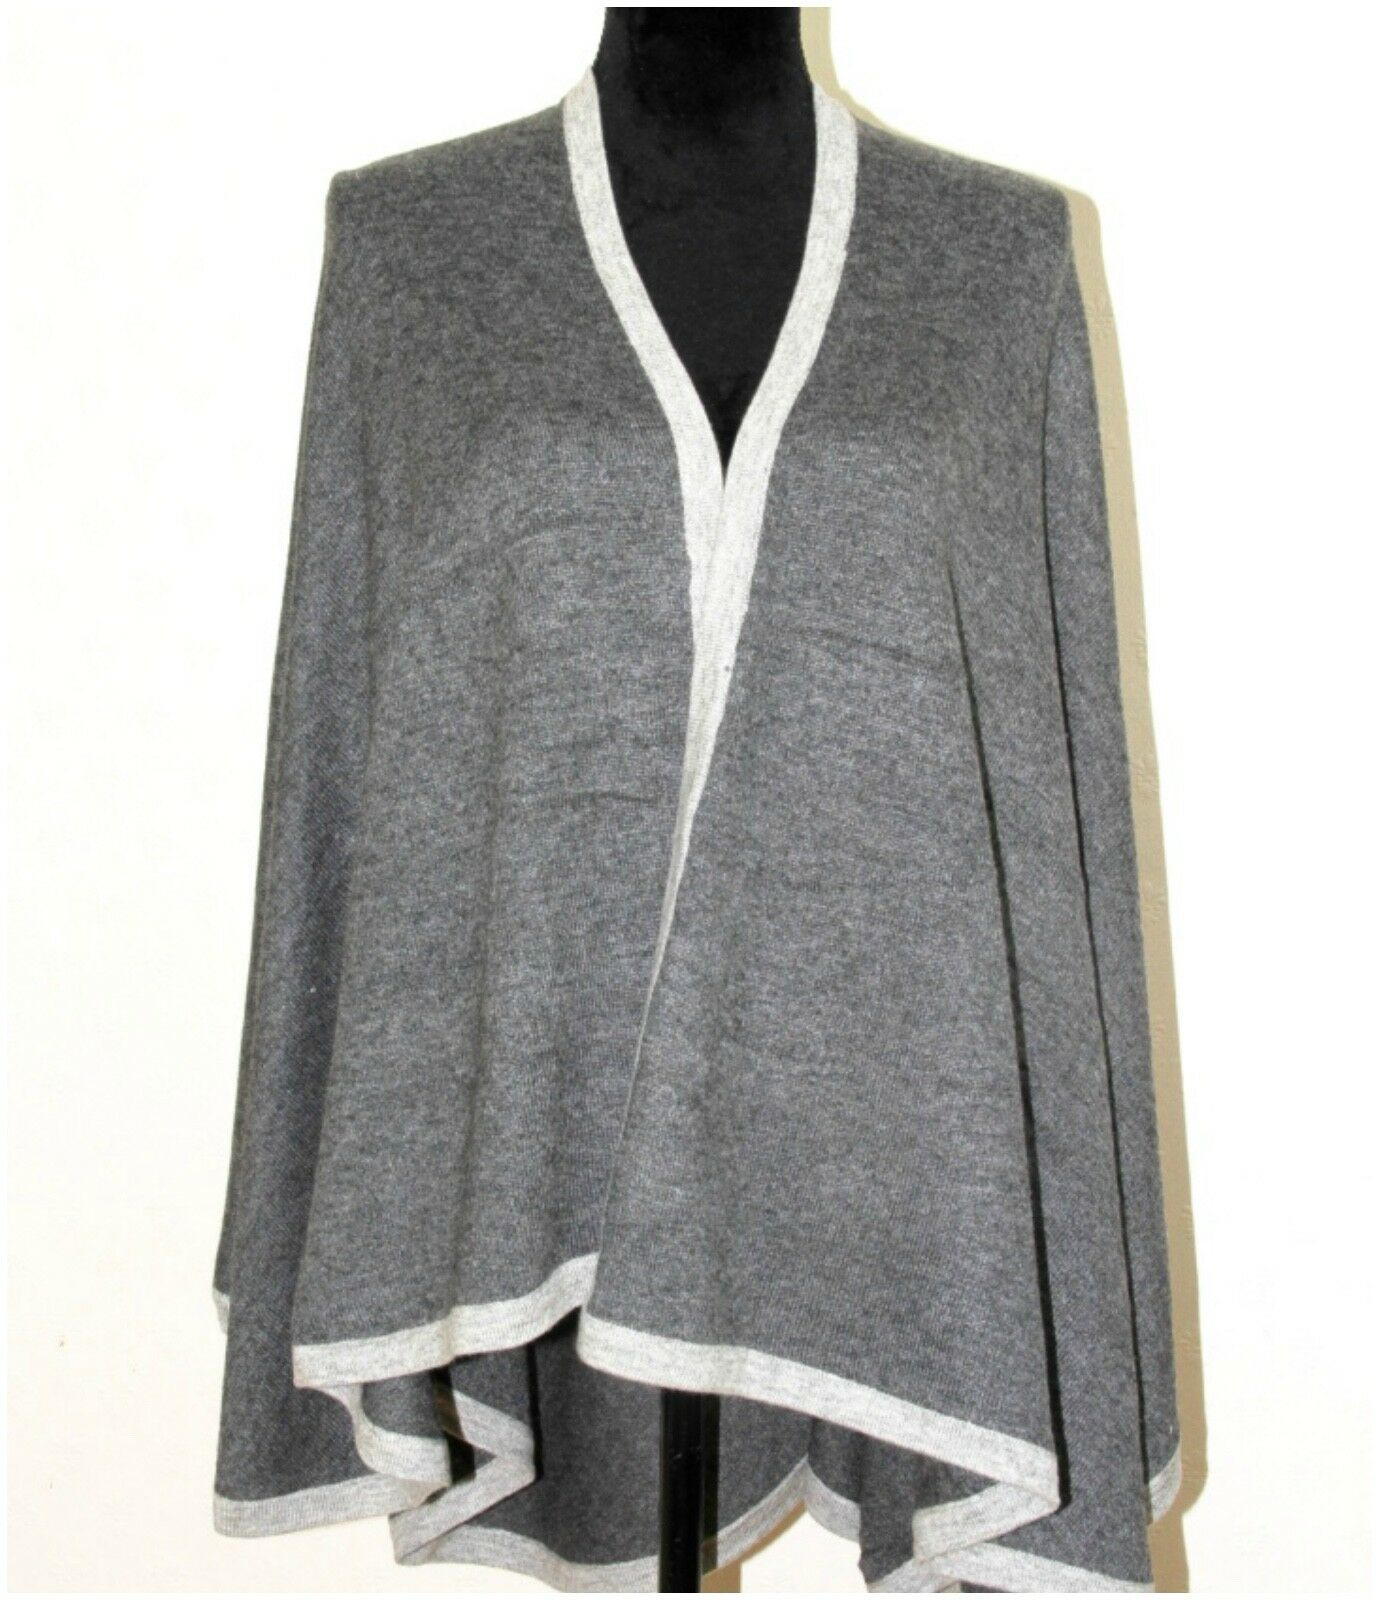 Cashmere Poncho Cape Wrap Pashmina Wool Shawl Jumper Coat Serape Serape Serape Blanket Warm a40aea